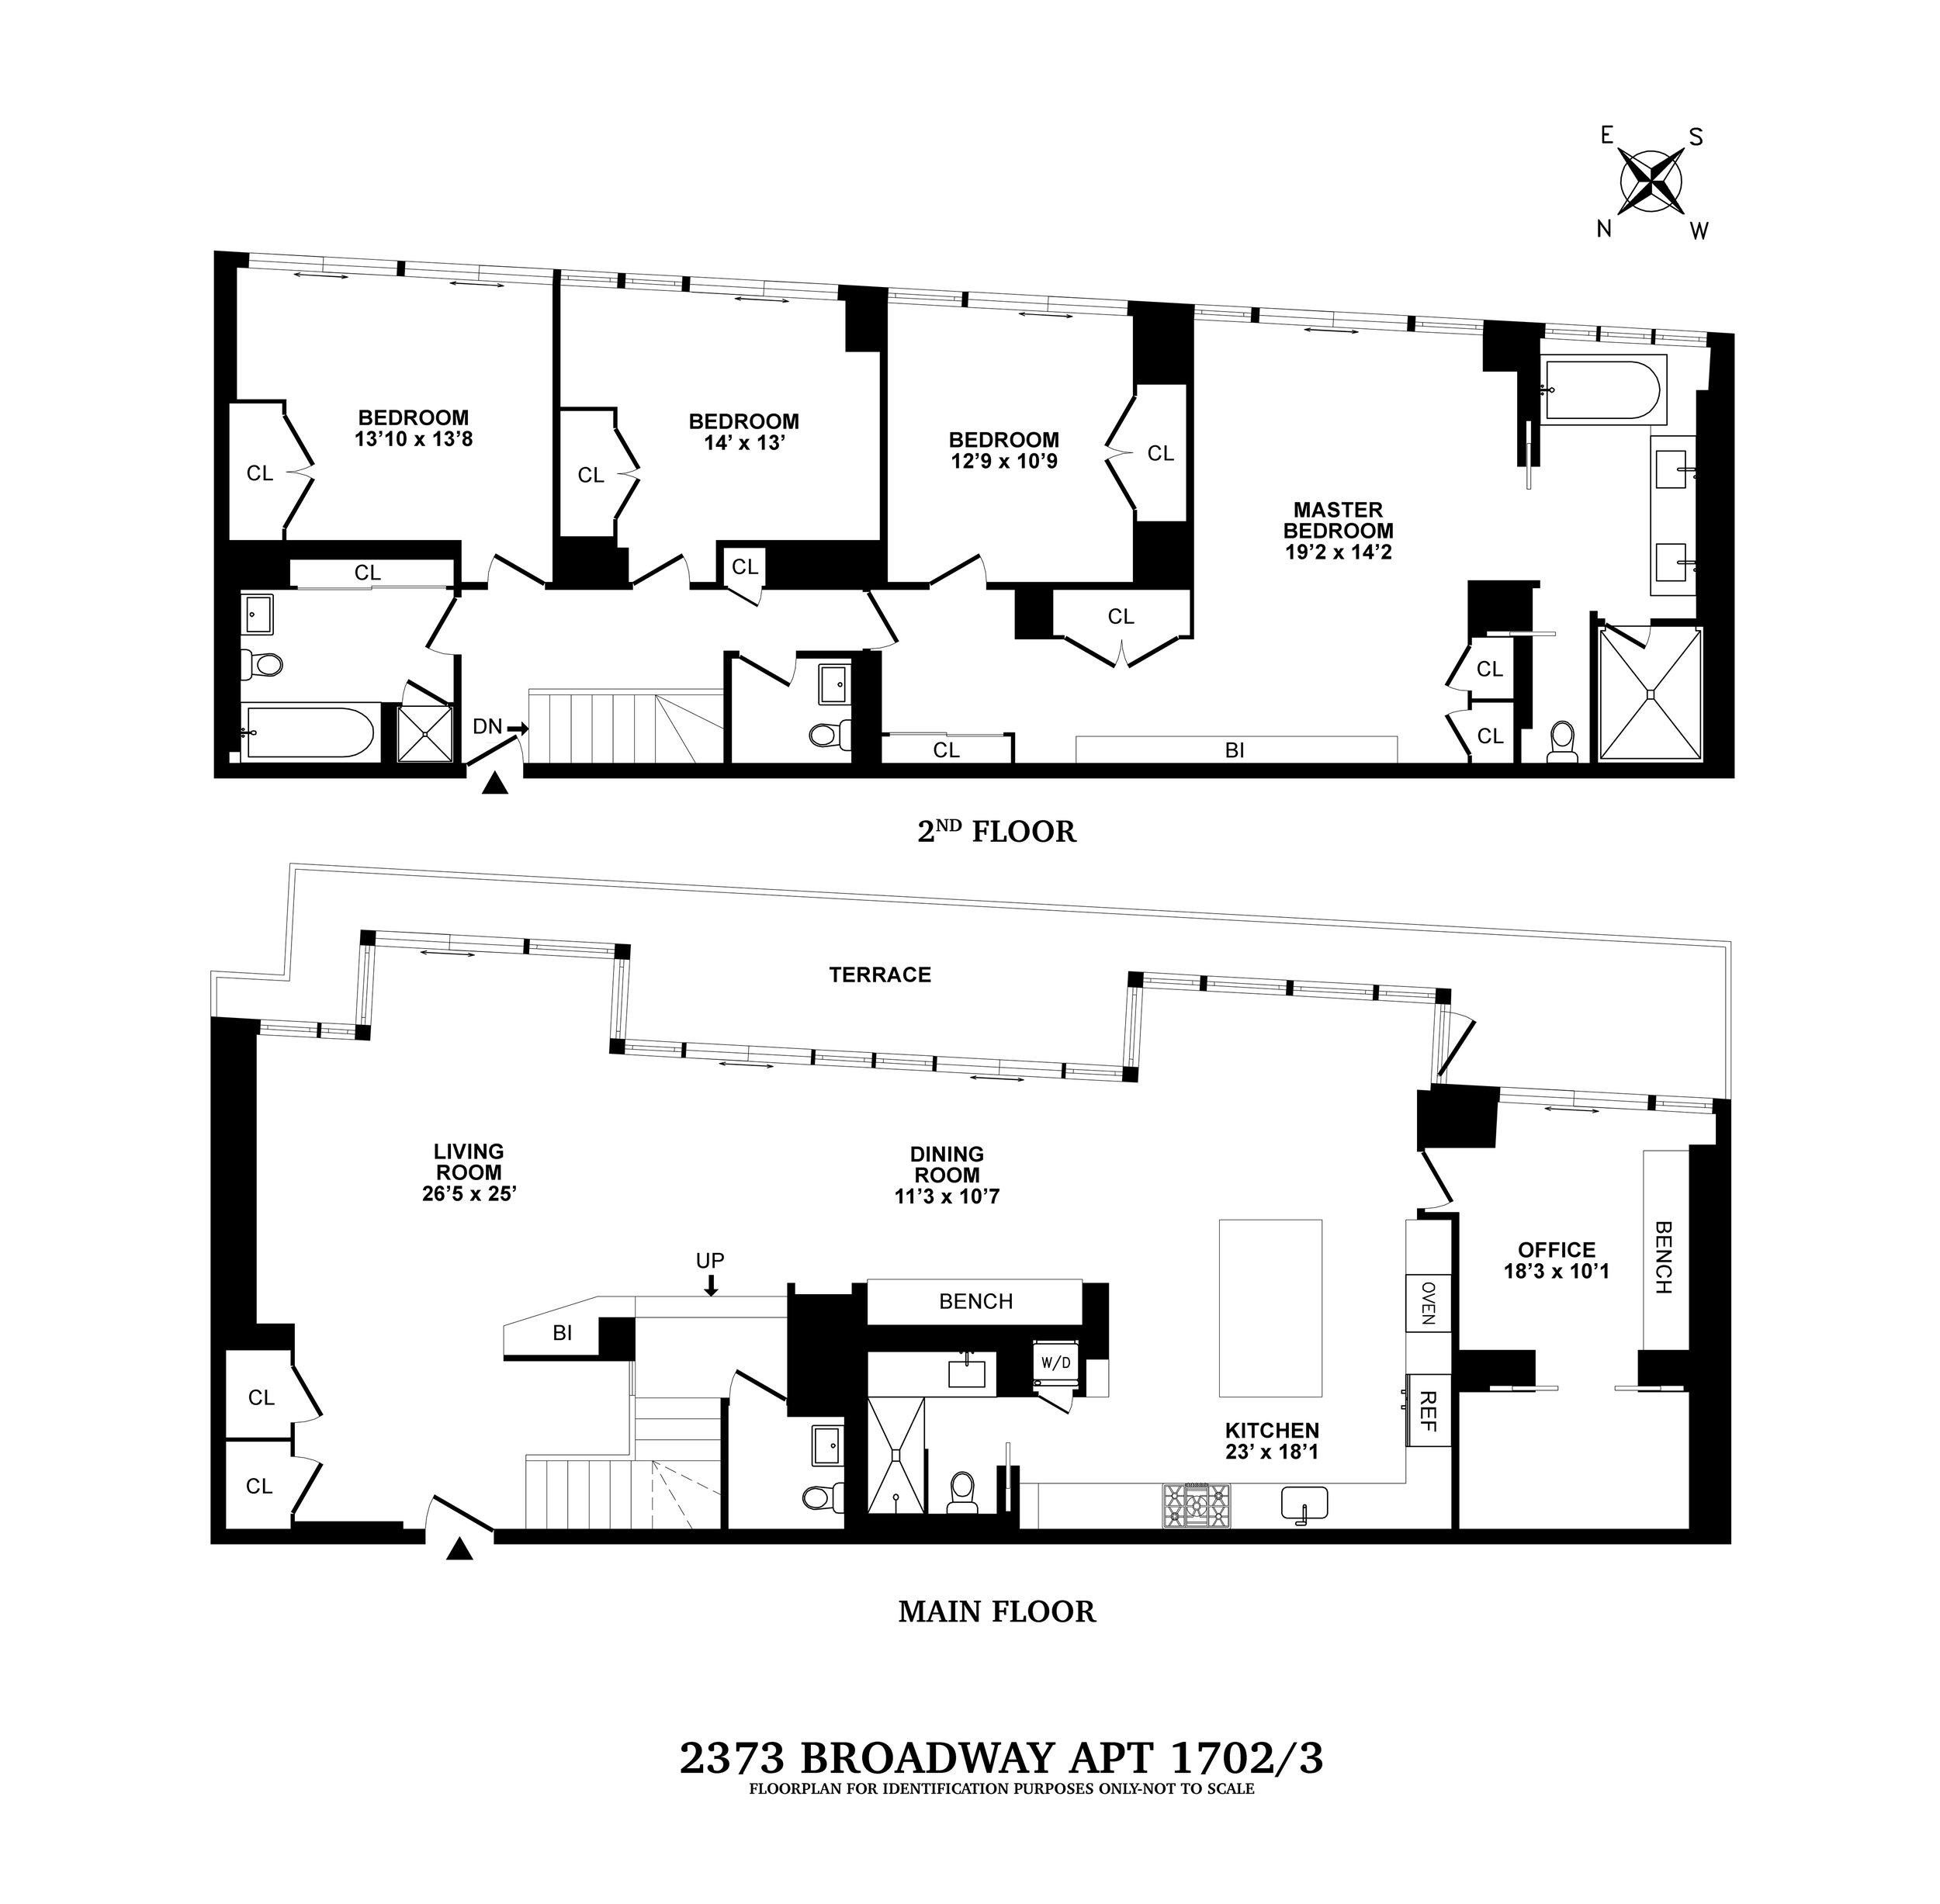 2373broadway1702-3-GPFP.jpg